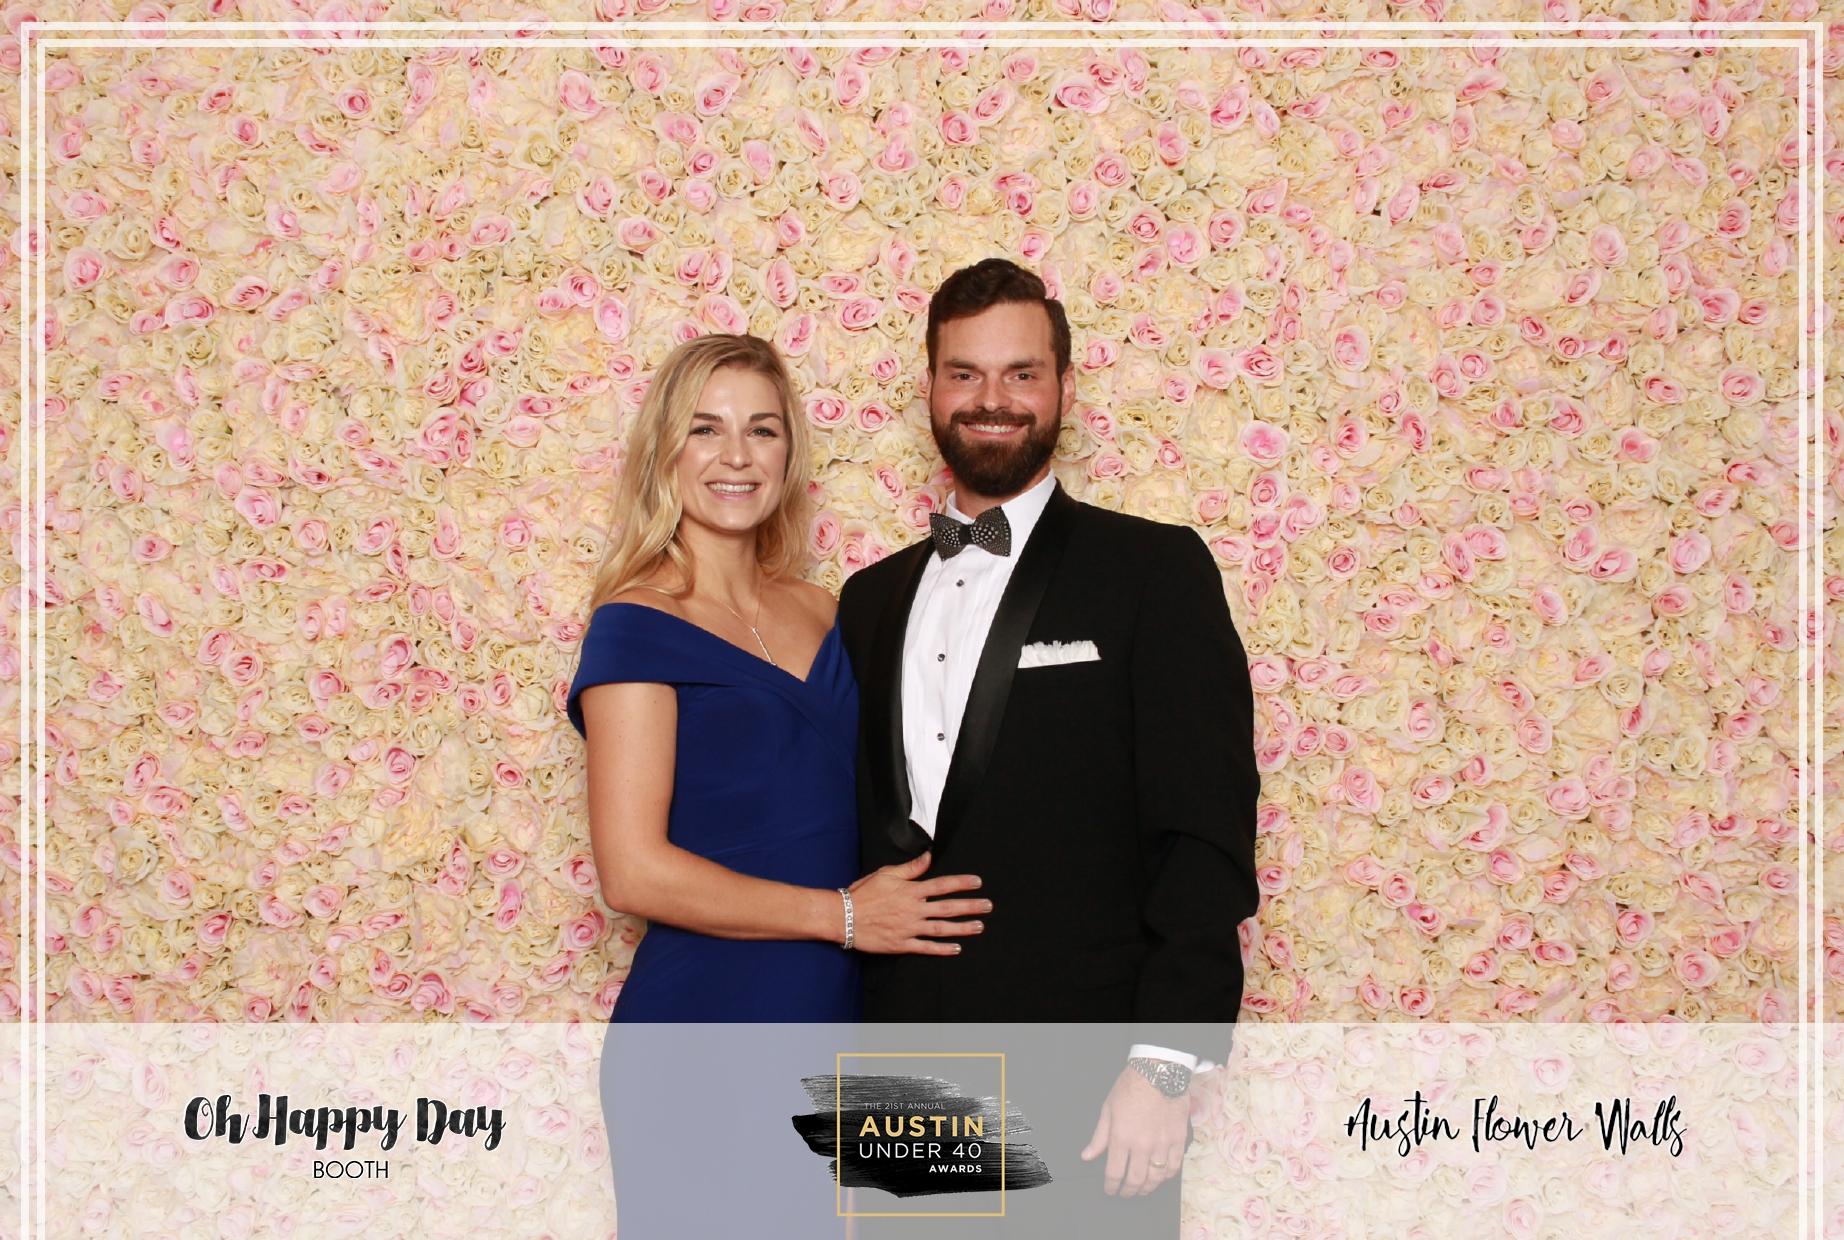 Oh Happy Day Booth - Austin Under 40-48.jpg